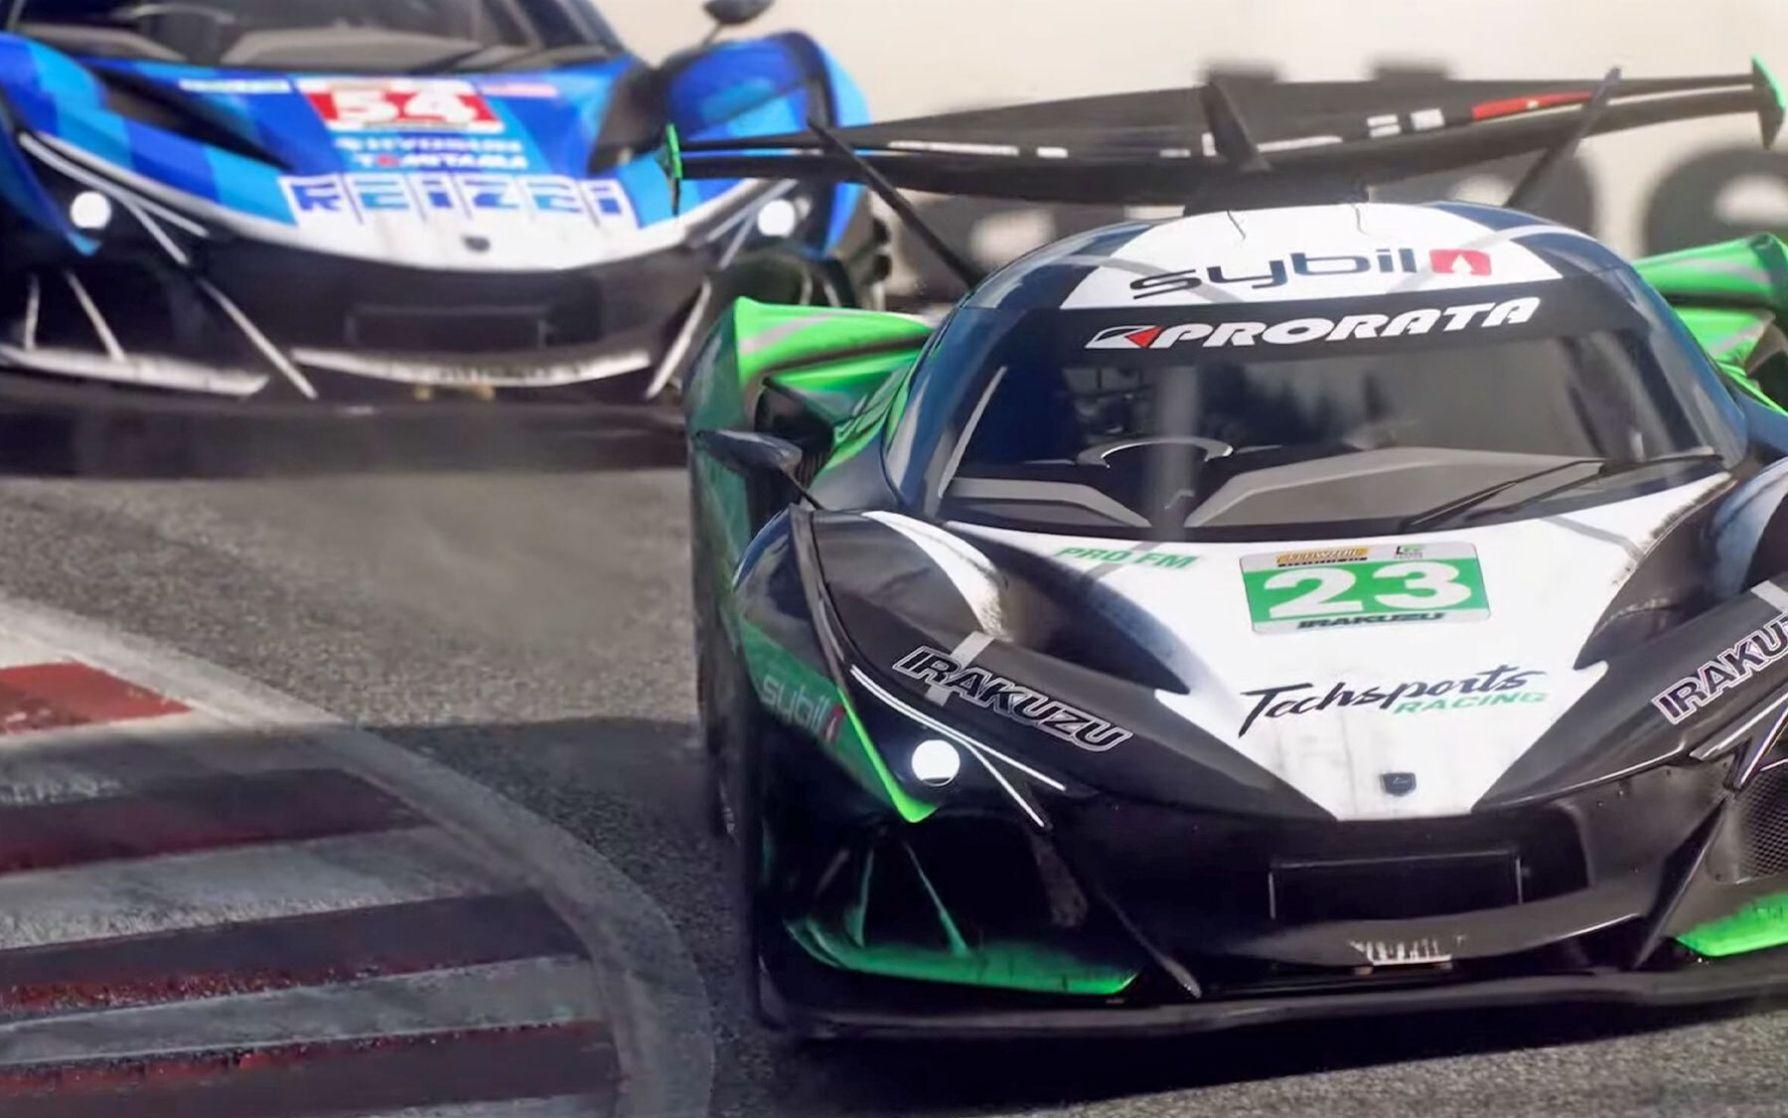 Forza cars Xbox Series X